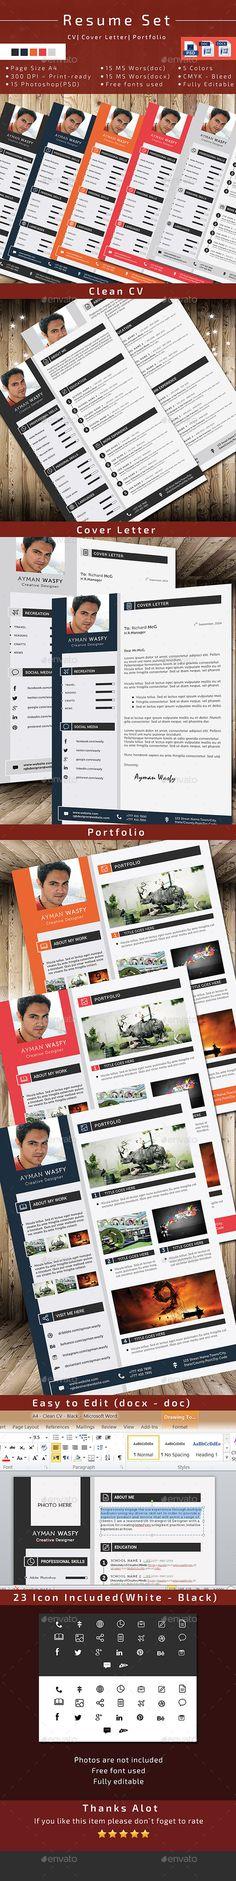 Resume CV Template #design #template Download: http://graphicriver.net/item/resume-cv/10257420?ref=ksioks